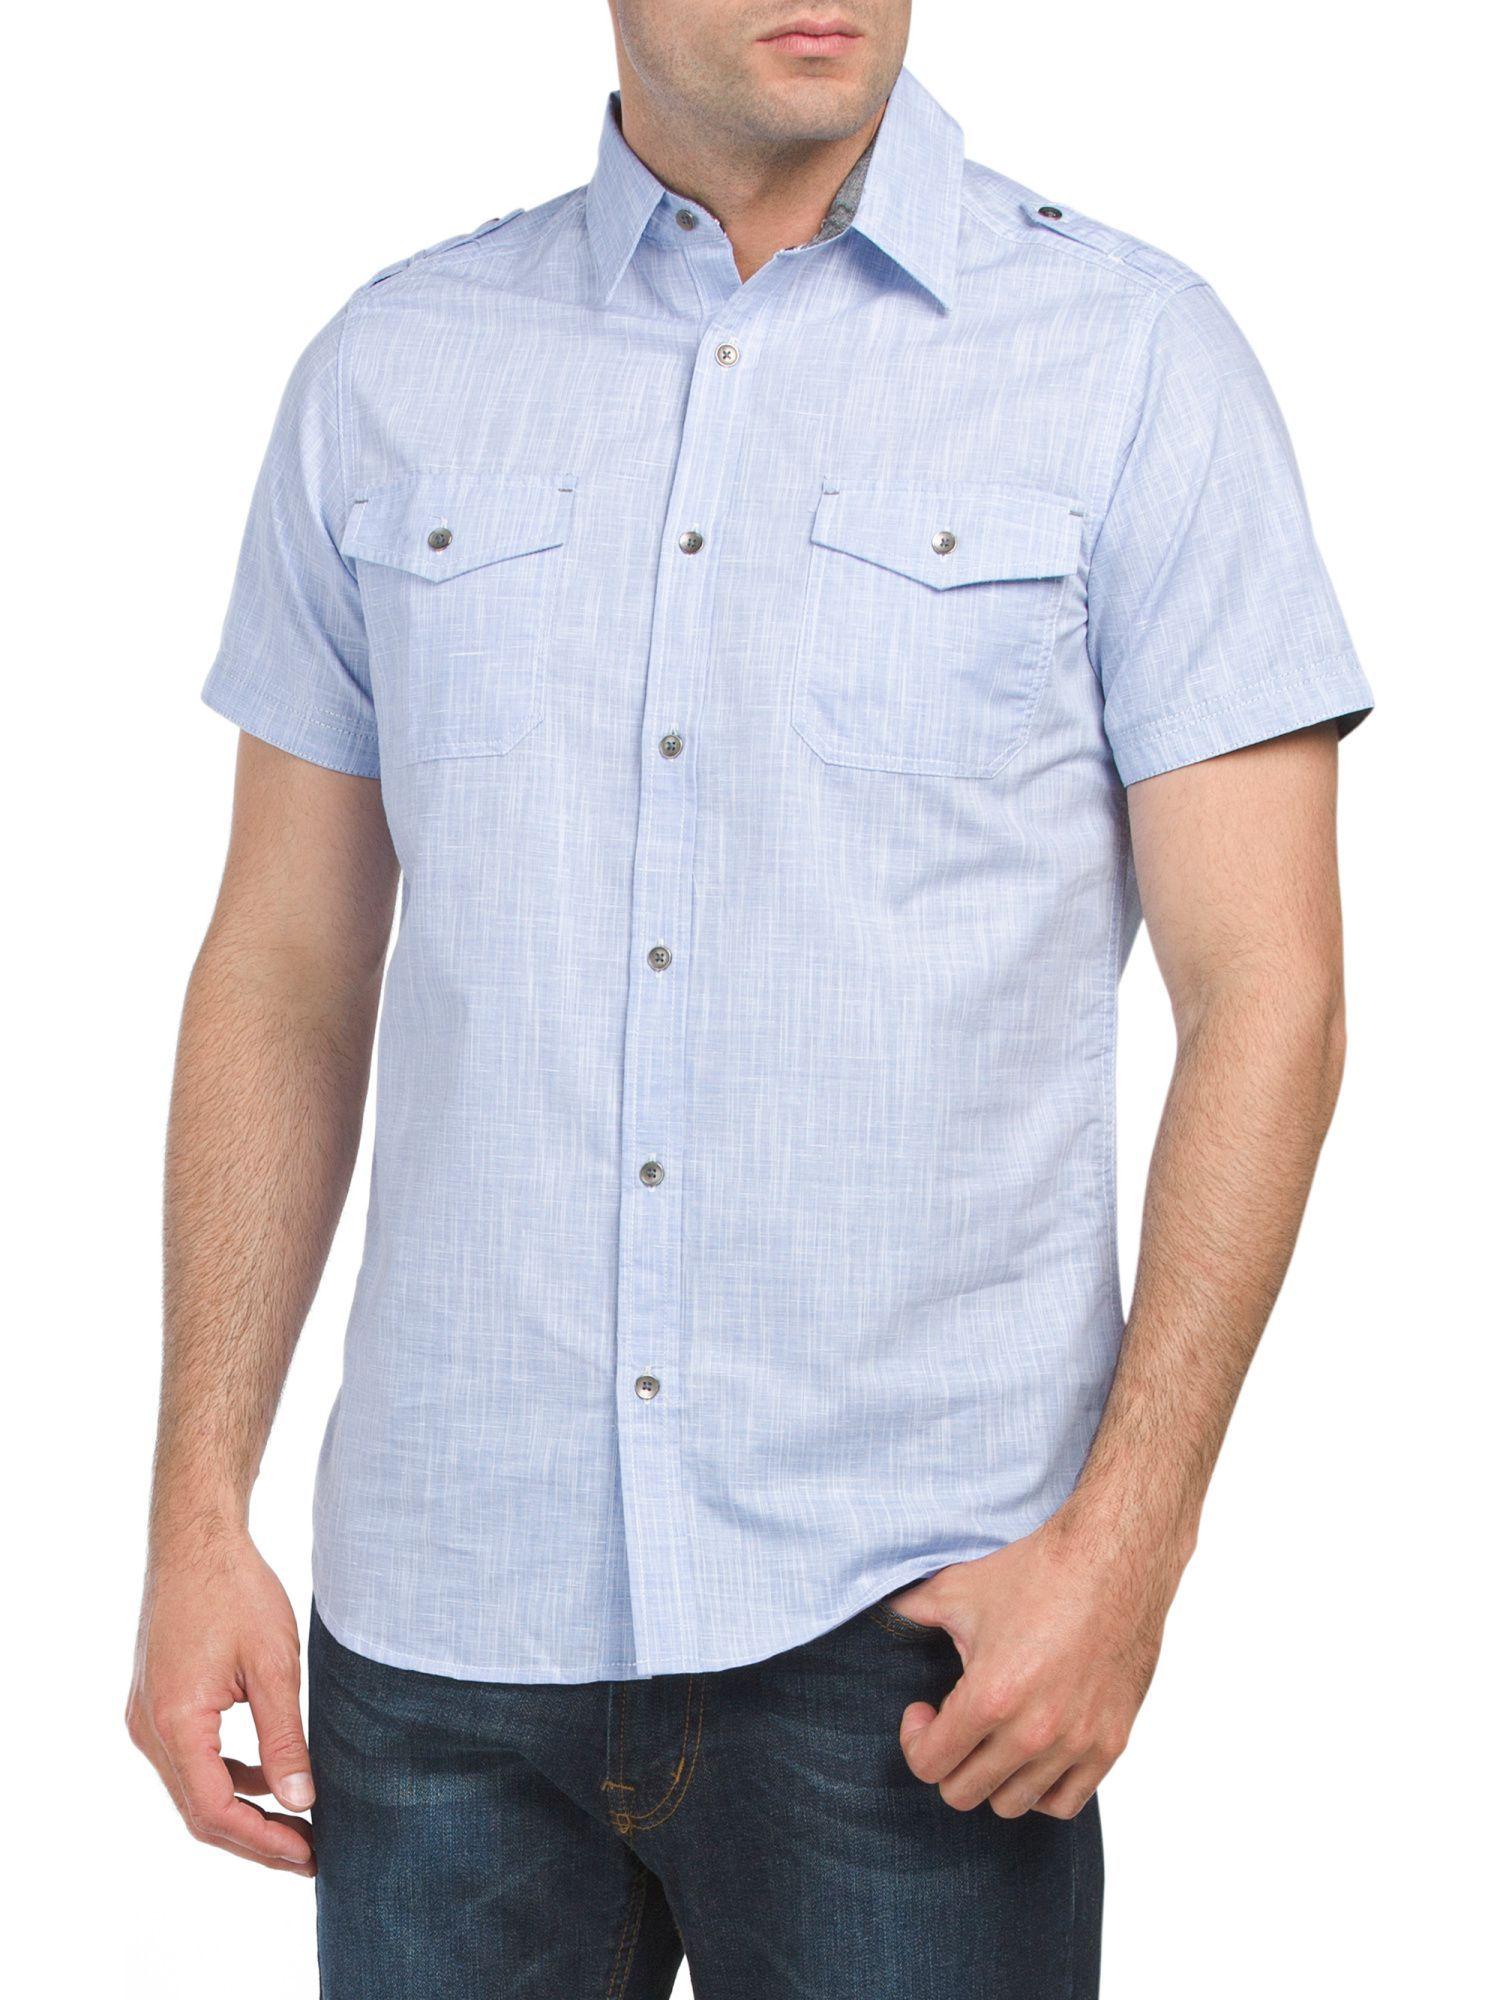 Short Sleeve Slub Knit Shirt